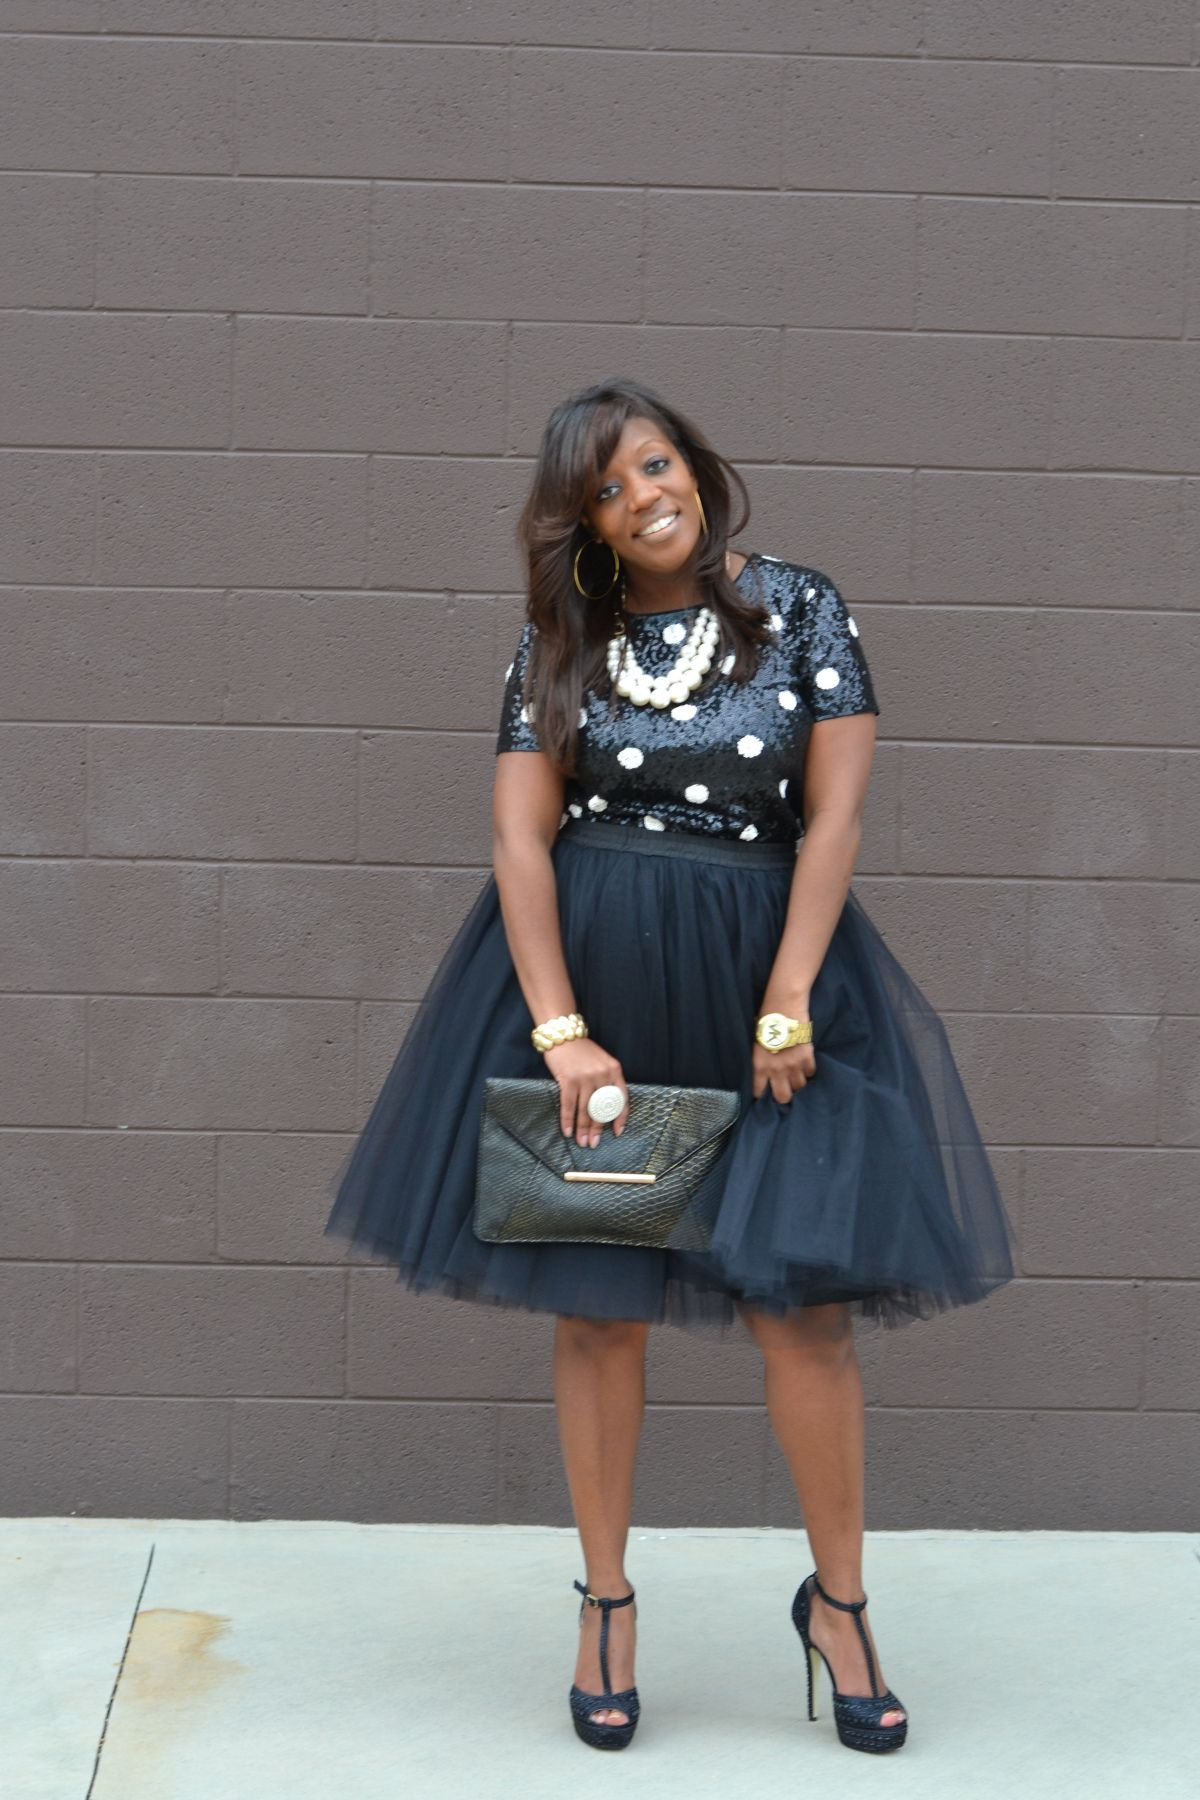 7772def06fd29f Kenya L Fashion Blog: Tulle Skirt - Holiday Party Style | Kenya L ...